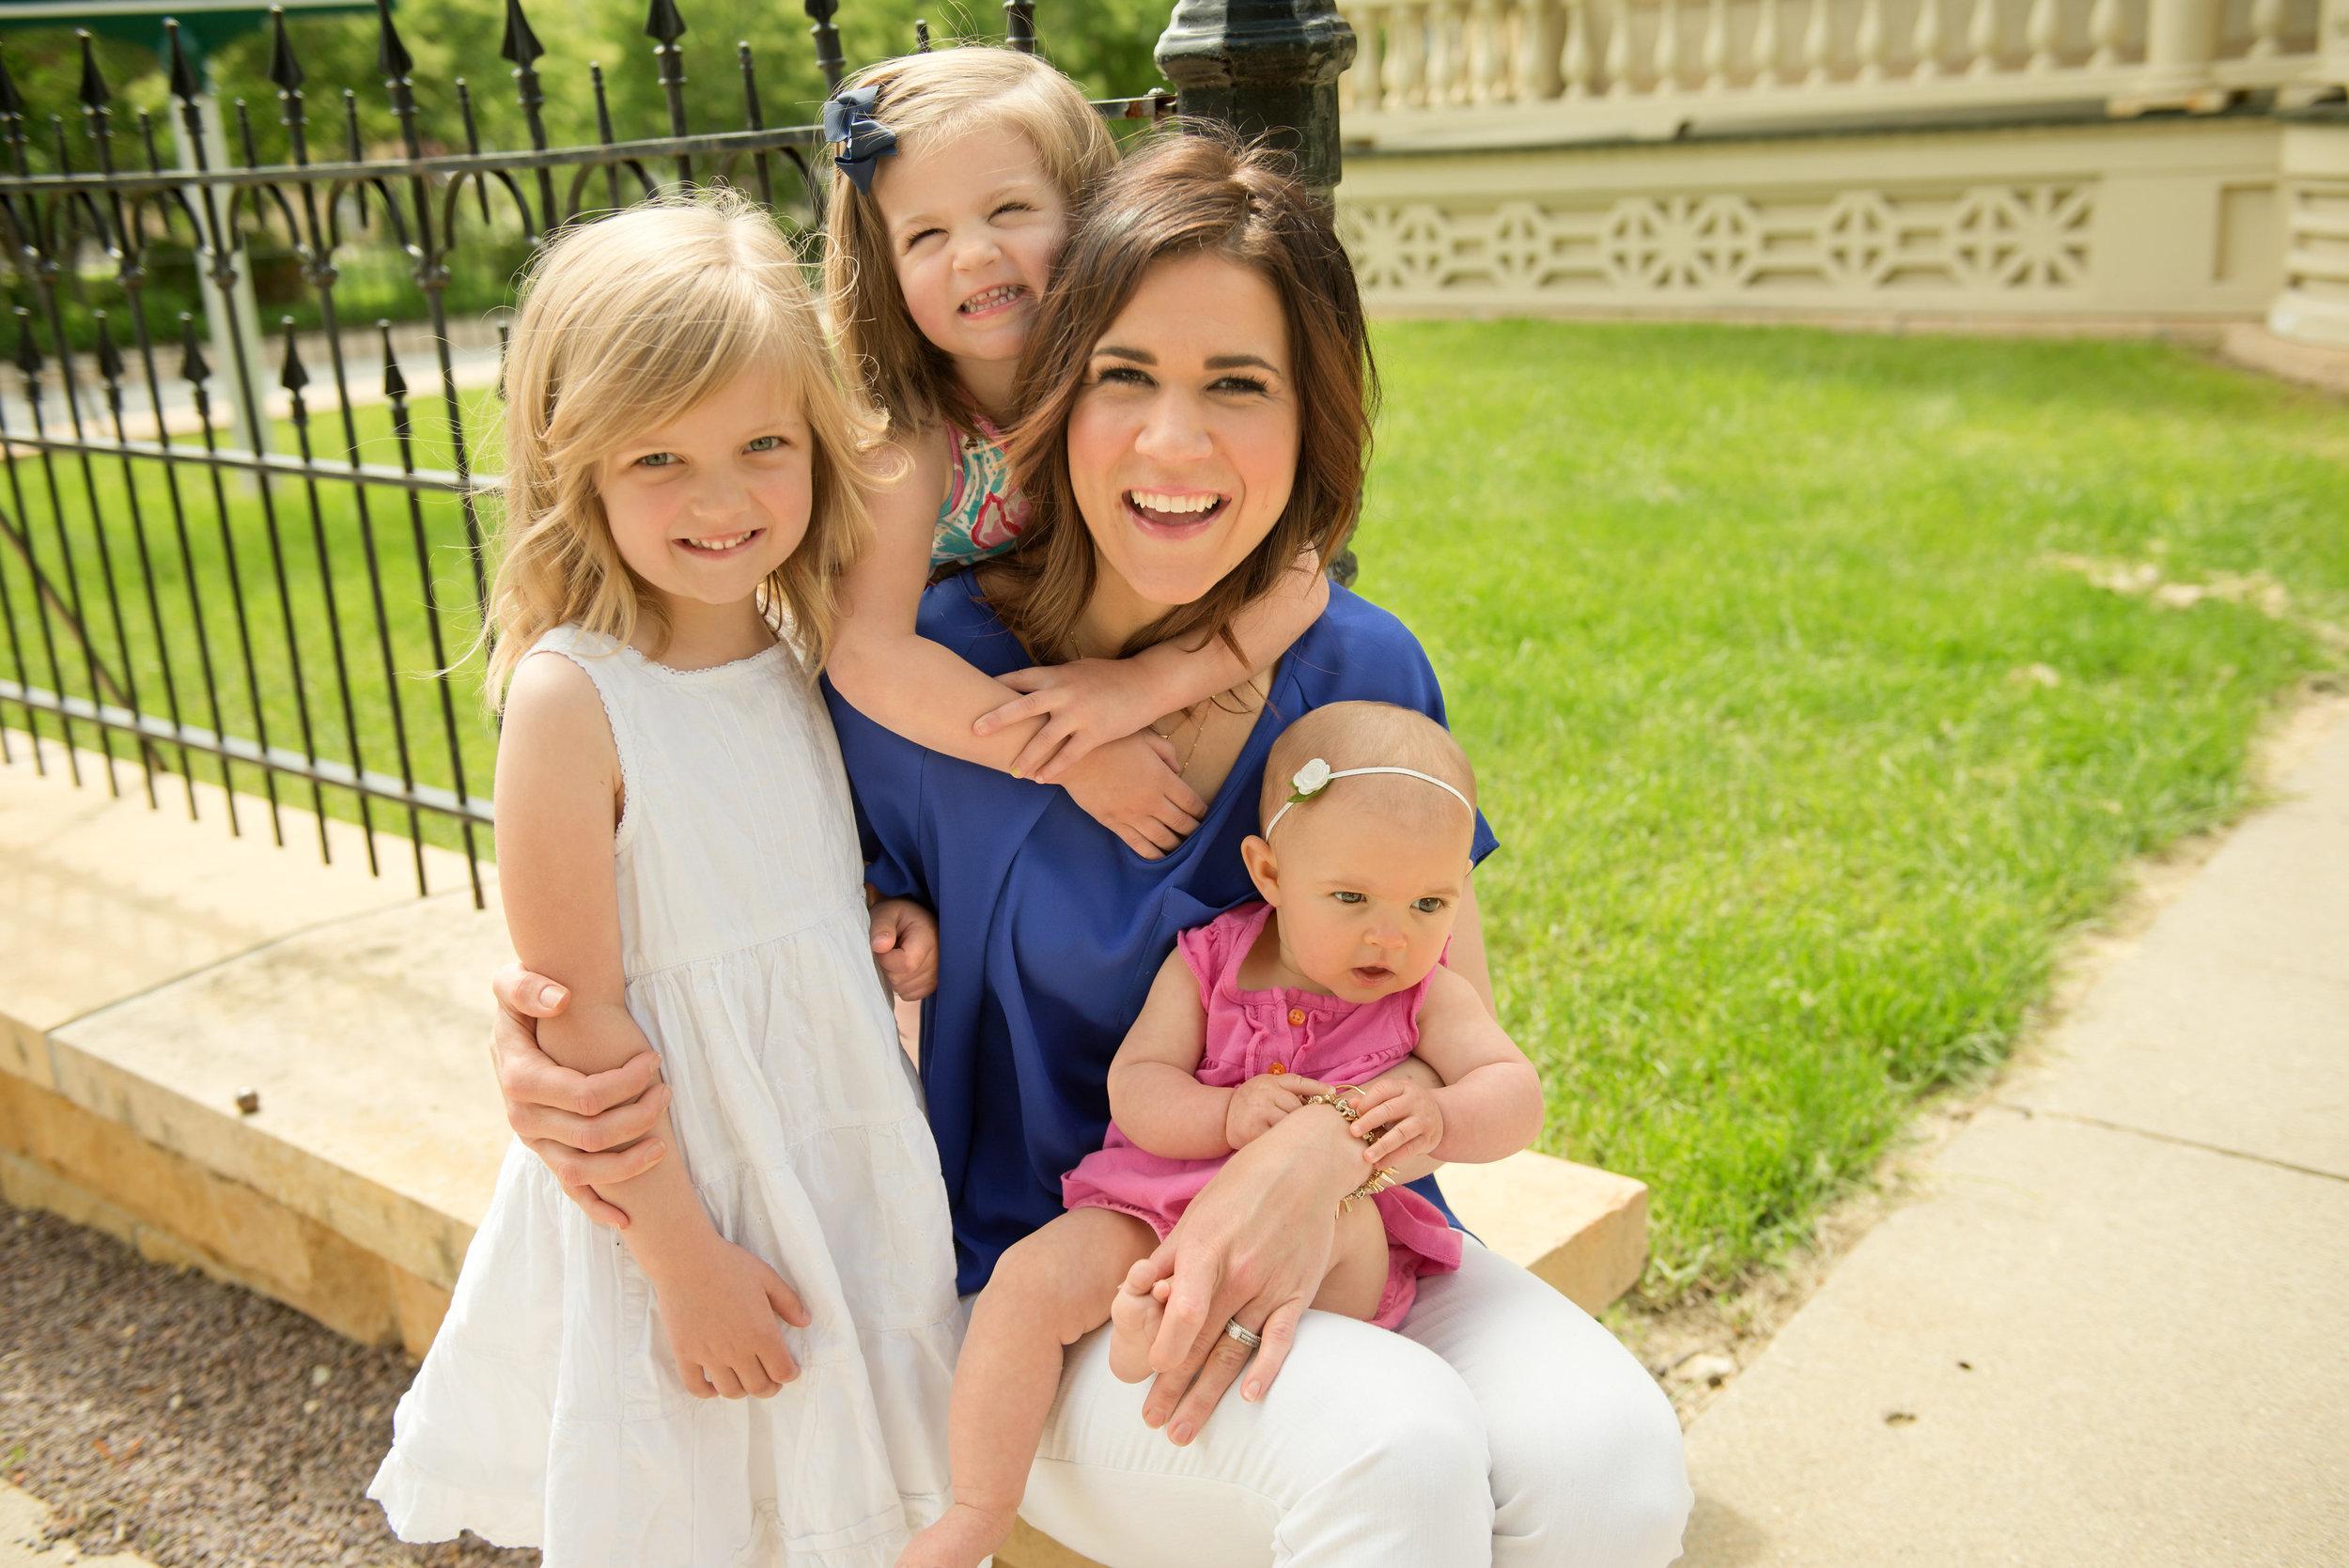 Orlando-mother-daughters.jpg